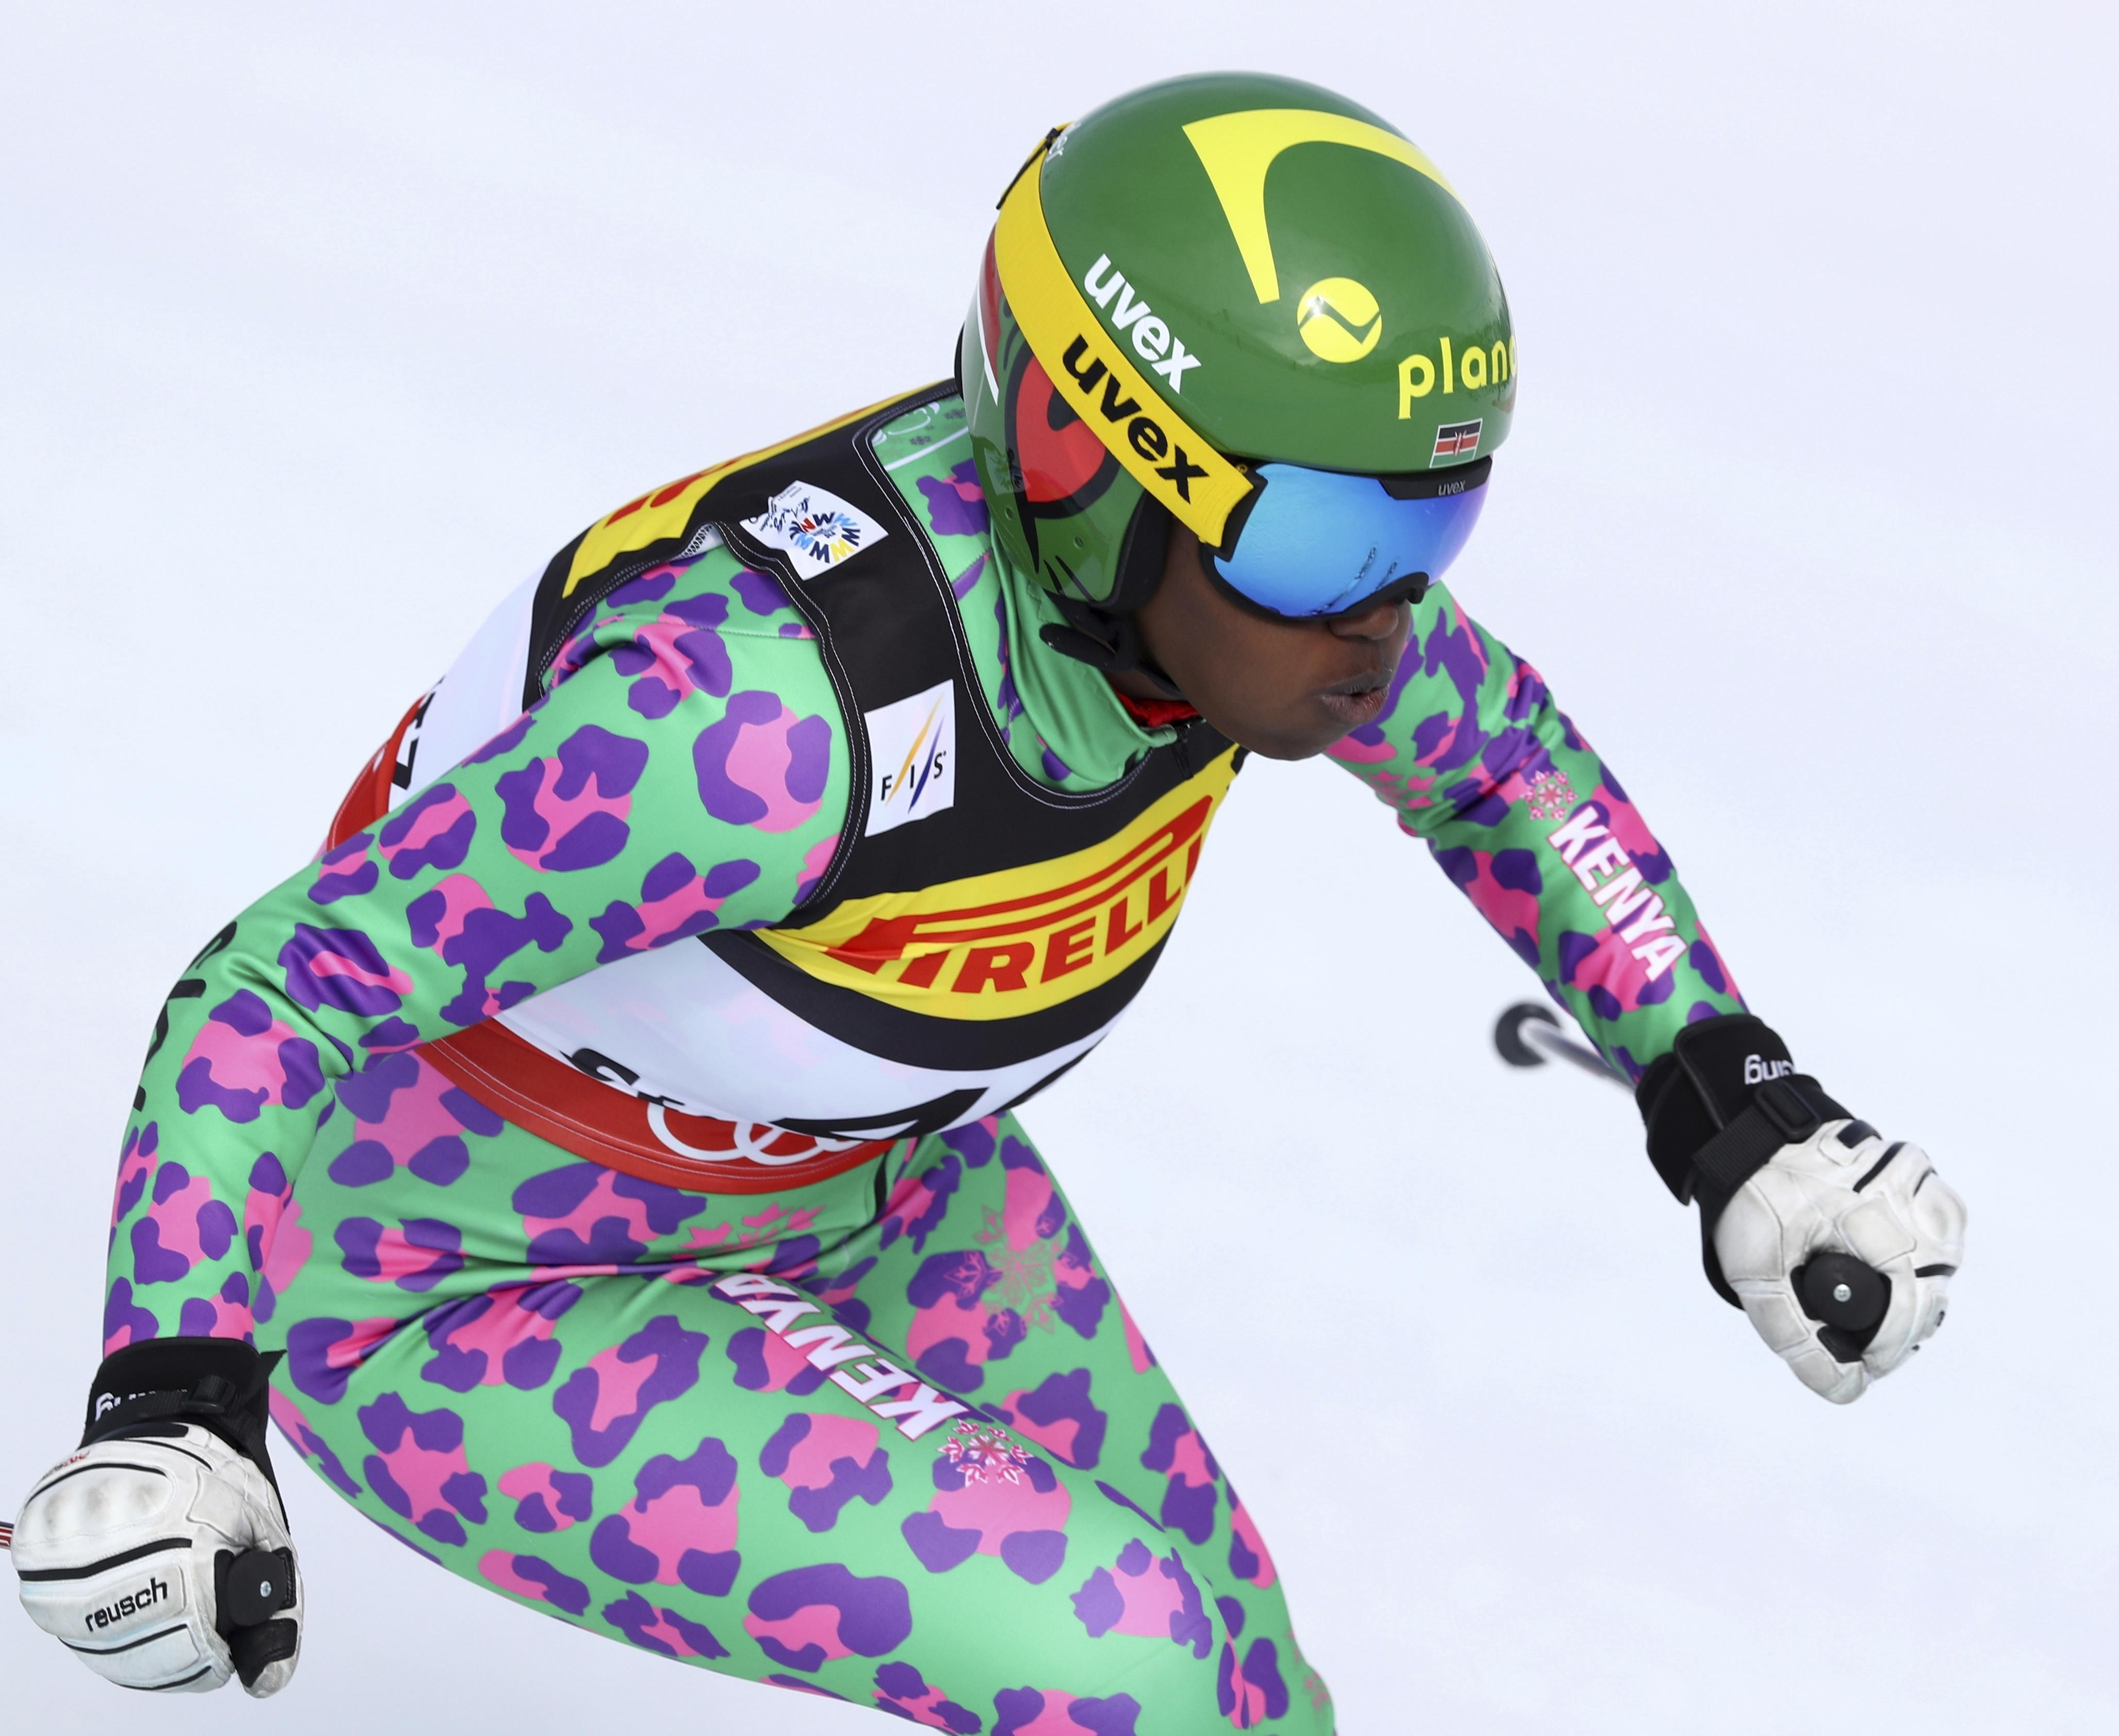 Kenya's Sabrina Simader speeds down the slope during a women's super-G, at the Alpine Ski World Championships, in St. Moritz, Switzerland, Tuesday, Feb. 7, 2017. (AP Photo/Alessandro Trovati)